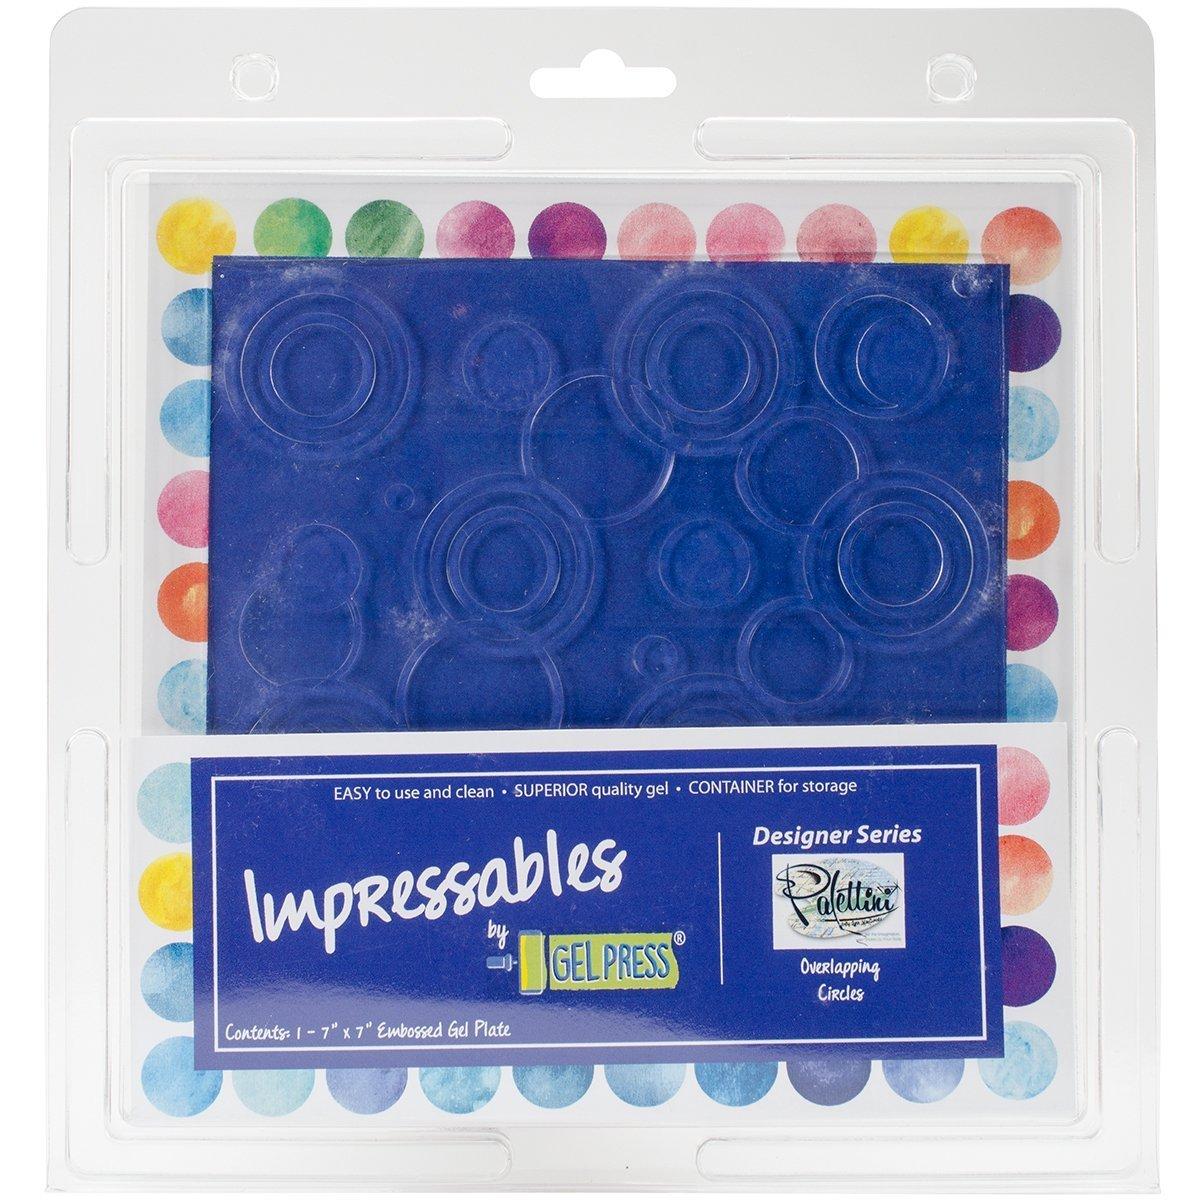 Gel Press Impressables 7'' Embossed Overlapping Circles Block Printing 10815-SLM-01